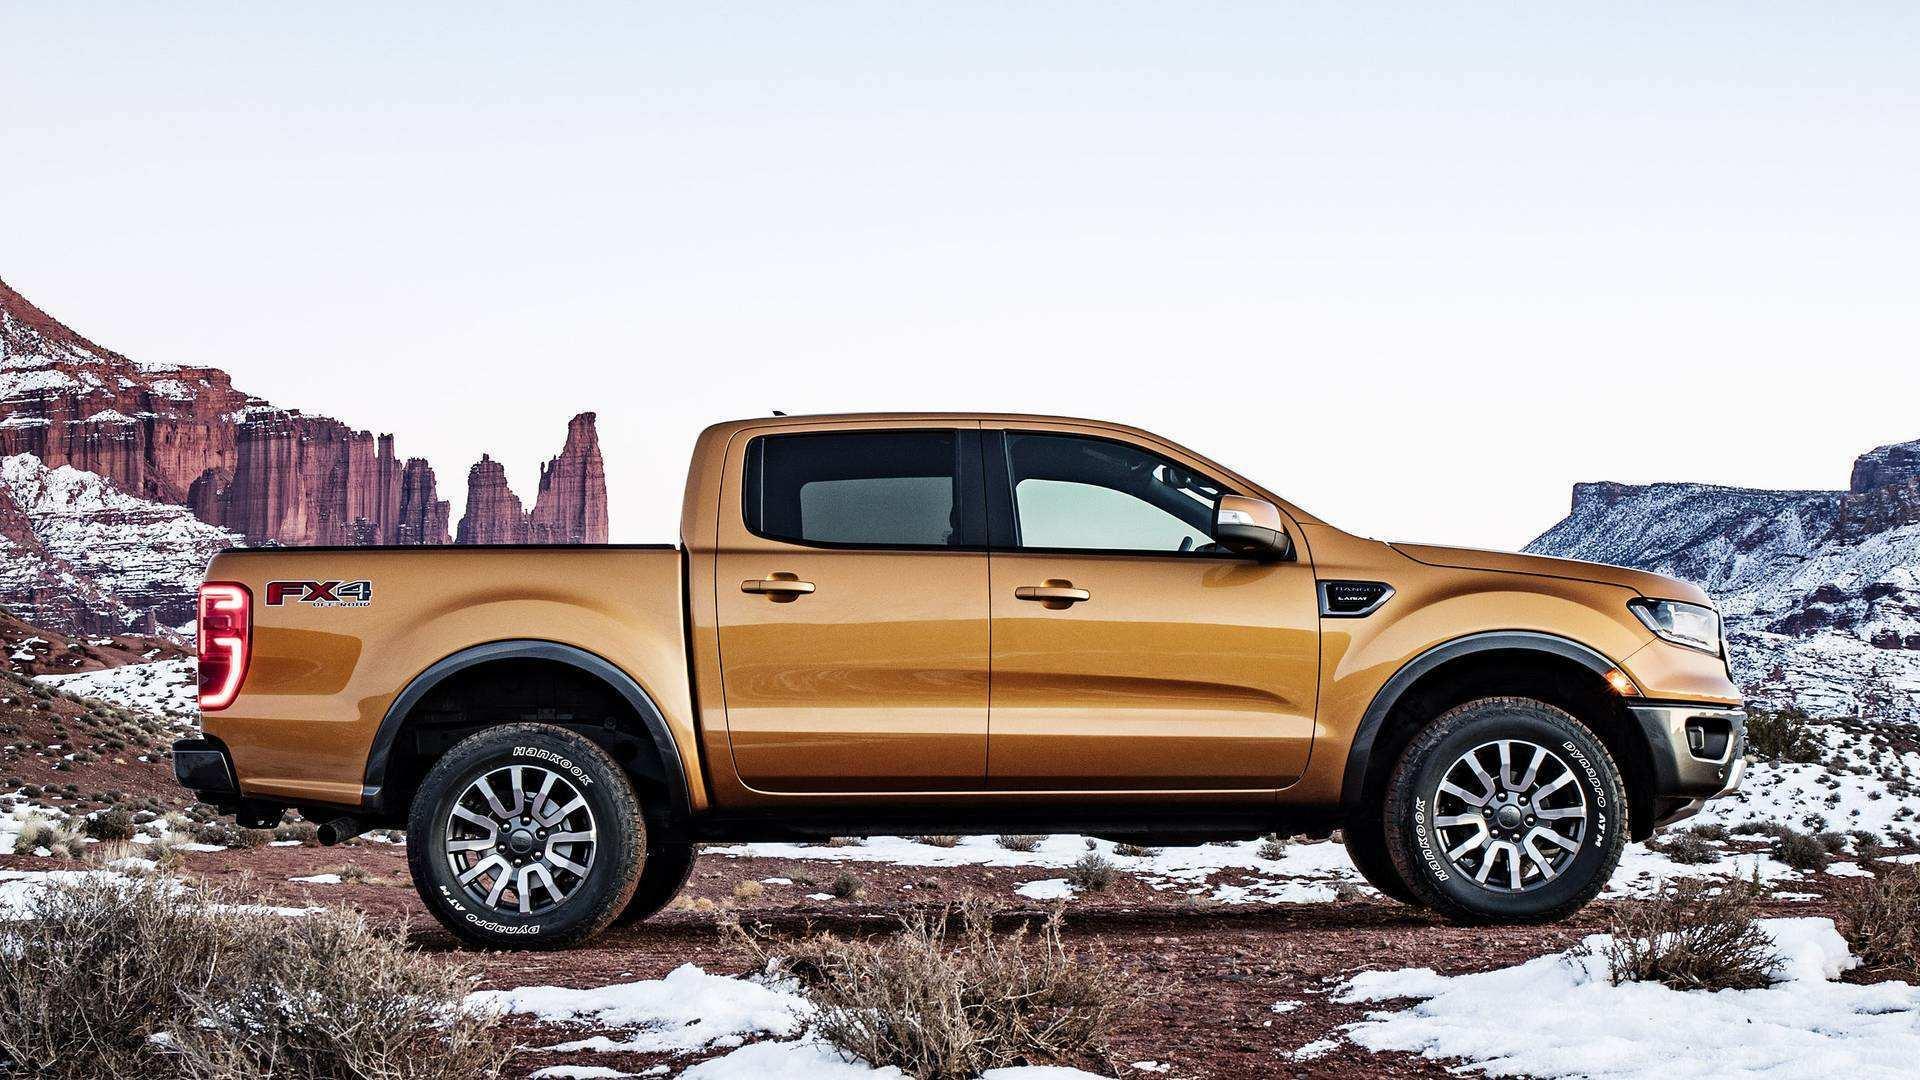 21 Gallery of Best Ford Wildtrak 2019 Release Date Photos with Best Ford Wildtrak 2019 Release Date